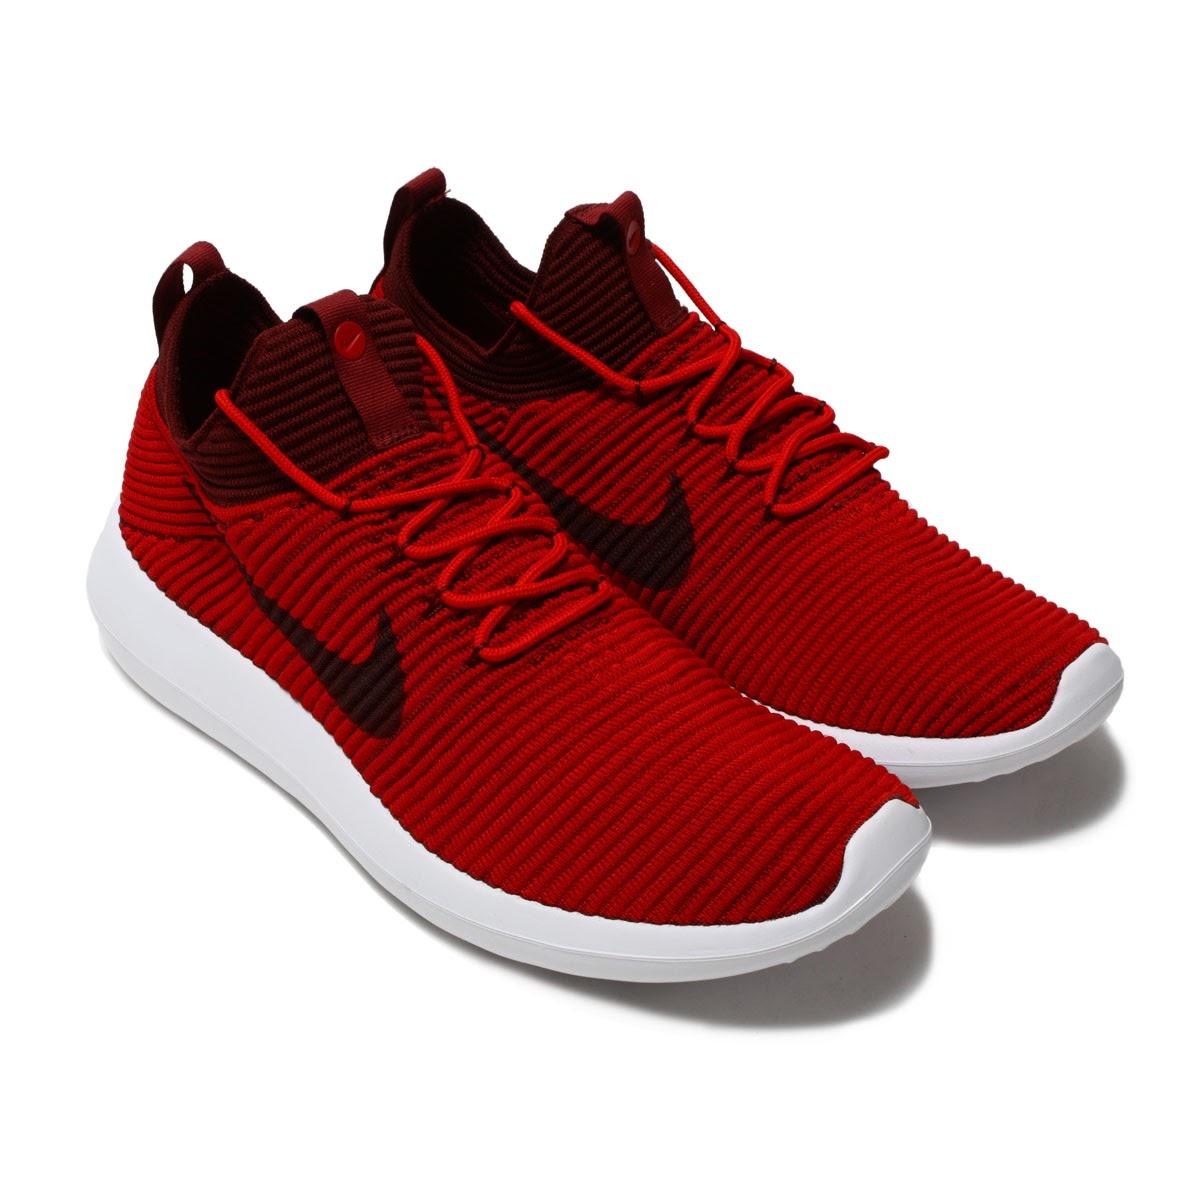 hot sale online bf7fb f718e NIKE ROSHE TWO FLYKNIT V2 (ナイキローシ 2 fly knit V2) UNIVERSITY RED/DARK TEAM  RED-WHITE 17FA-I